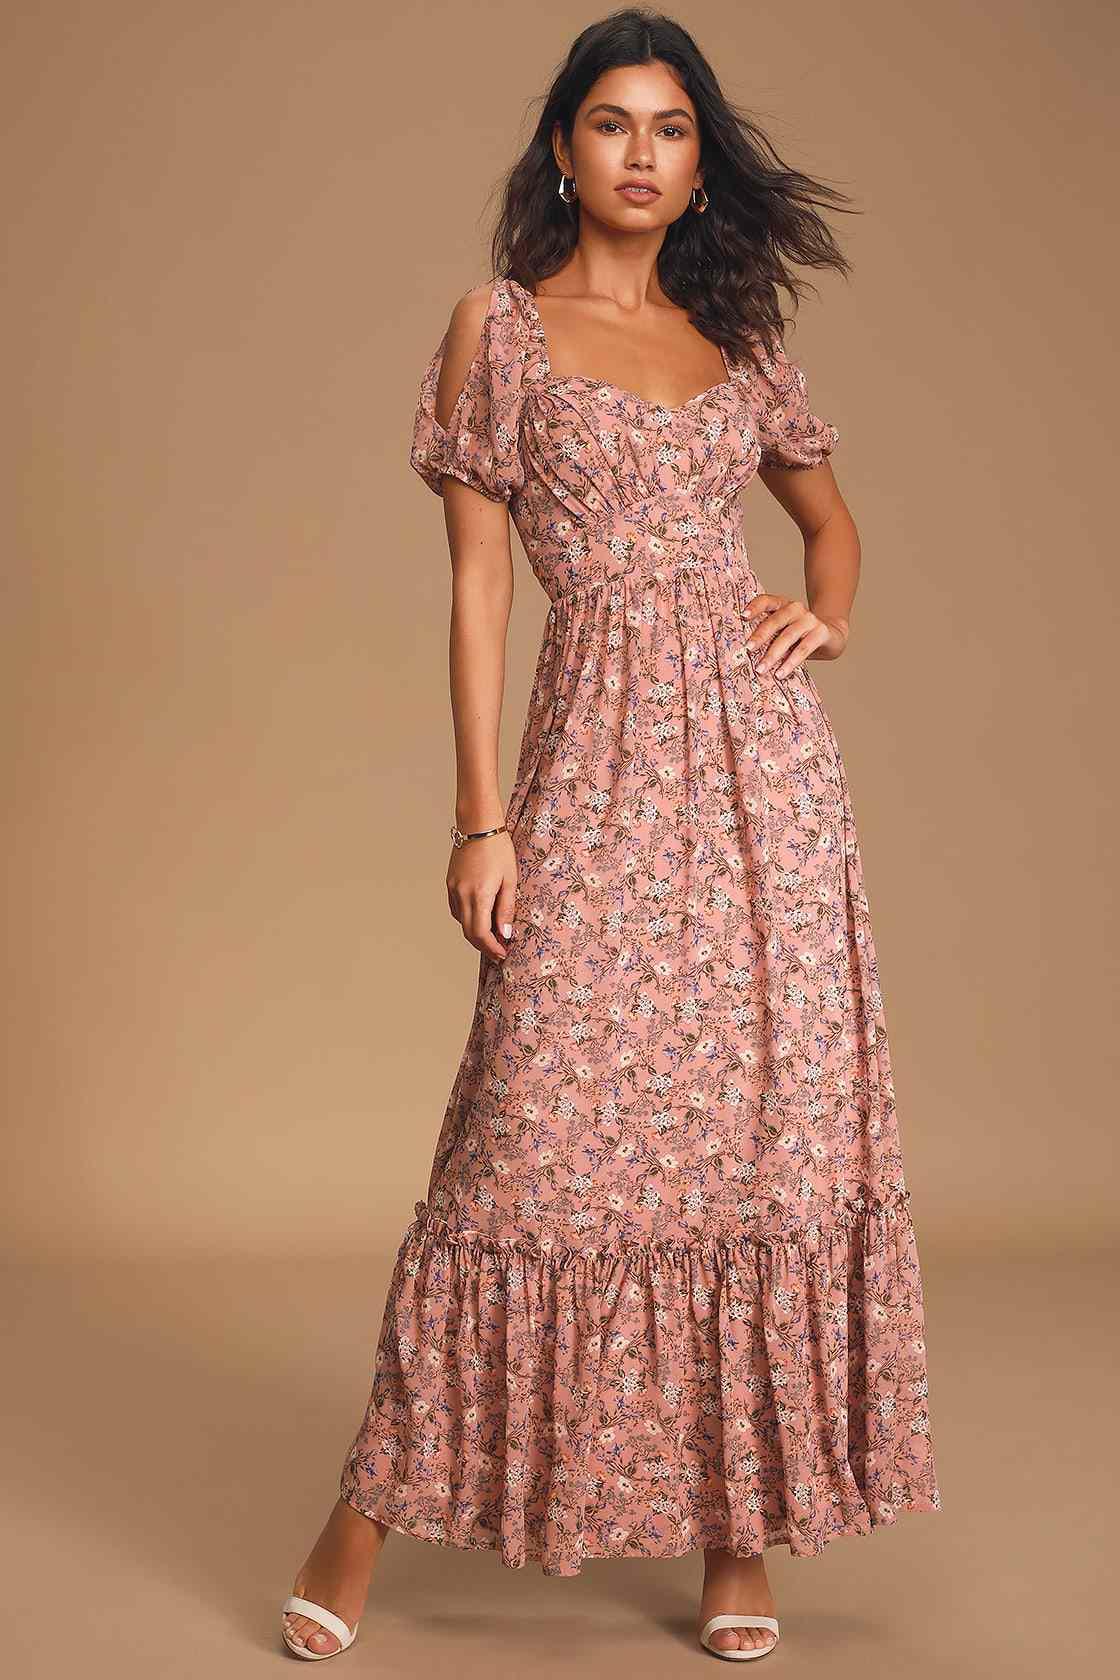 Feeling Fond Mauve Floral Print Puff Sleeve Maxi Dress $69